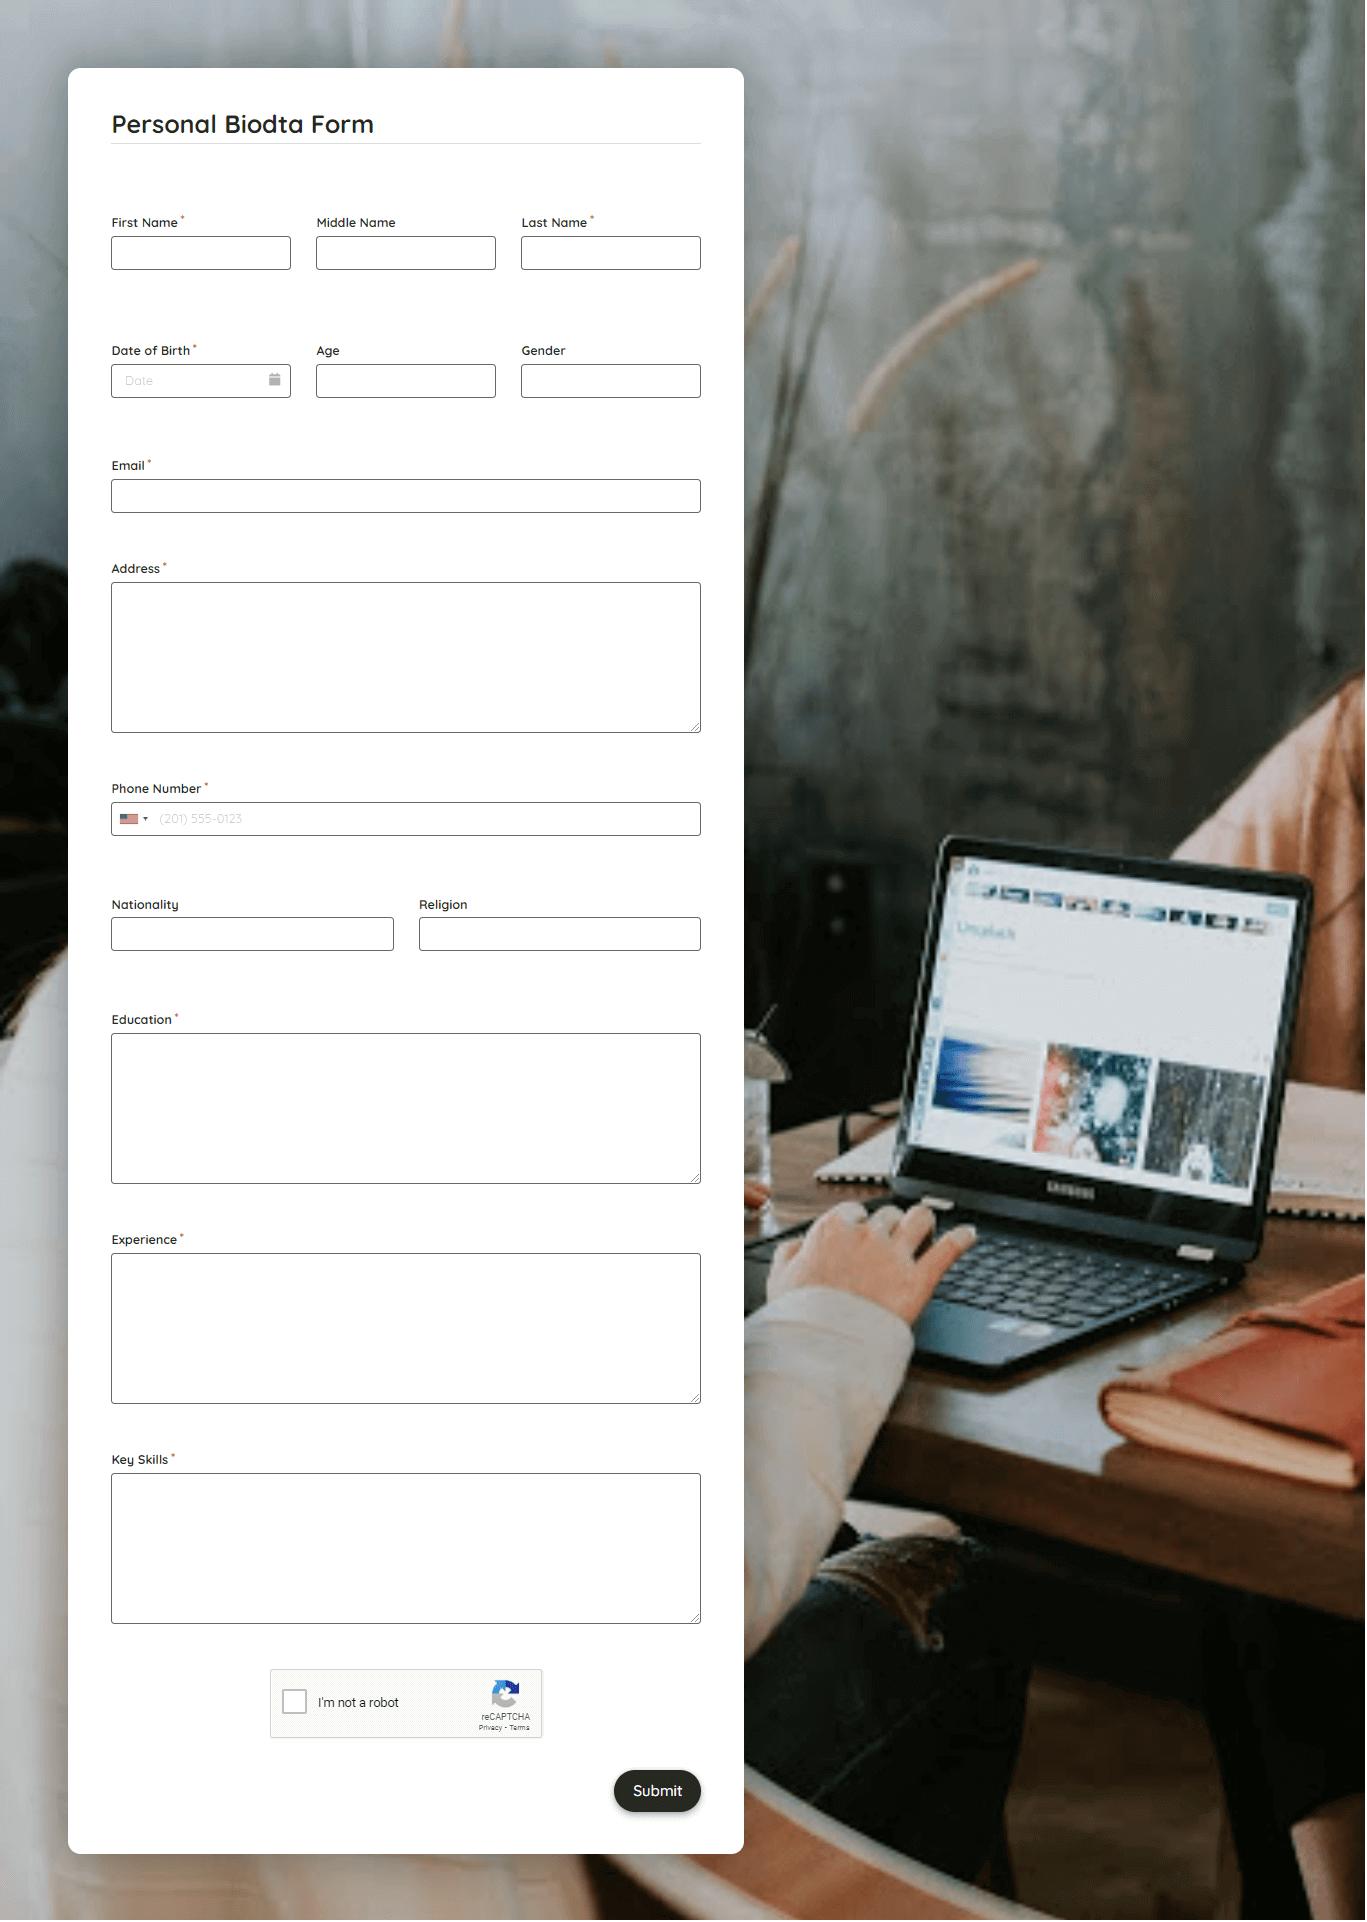 Personal Biodata Form Template template